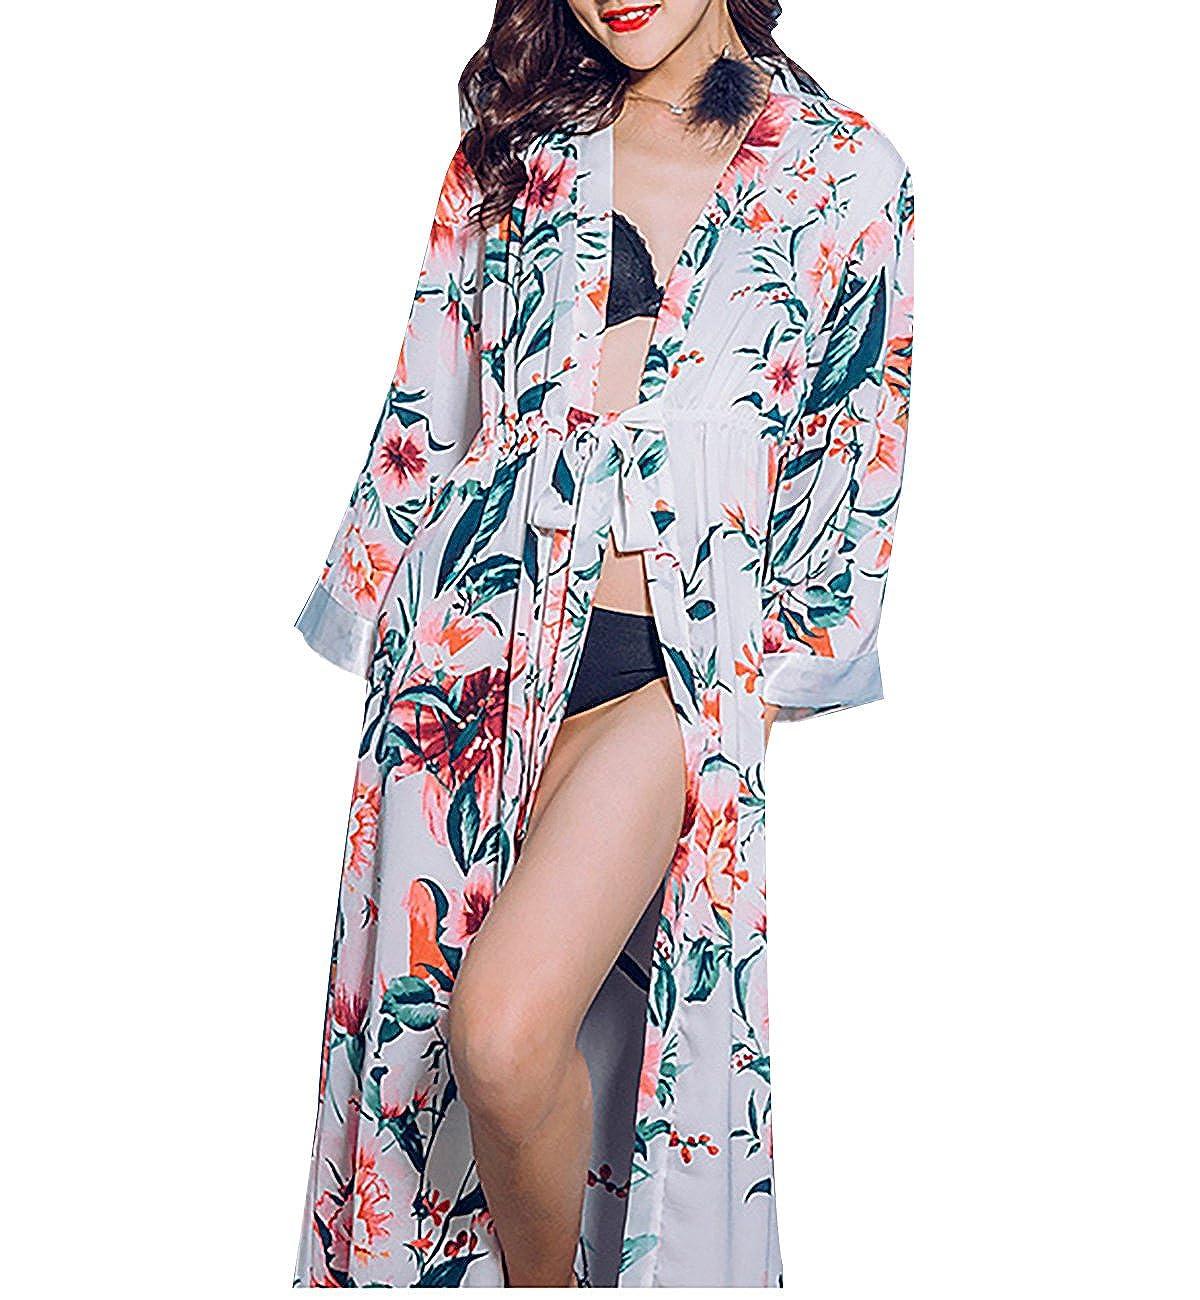 Surenow Women s Satin Polyester Silk Dressing Gown Floral Pattern High  Split Sexy Lepoard Sleepwear Loungewear Elegant Kimono Long Bath Robe  Comfortable ... 3e590cc5d